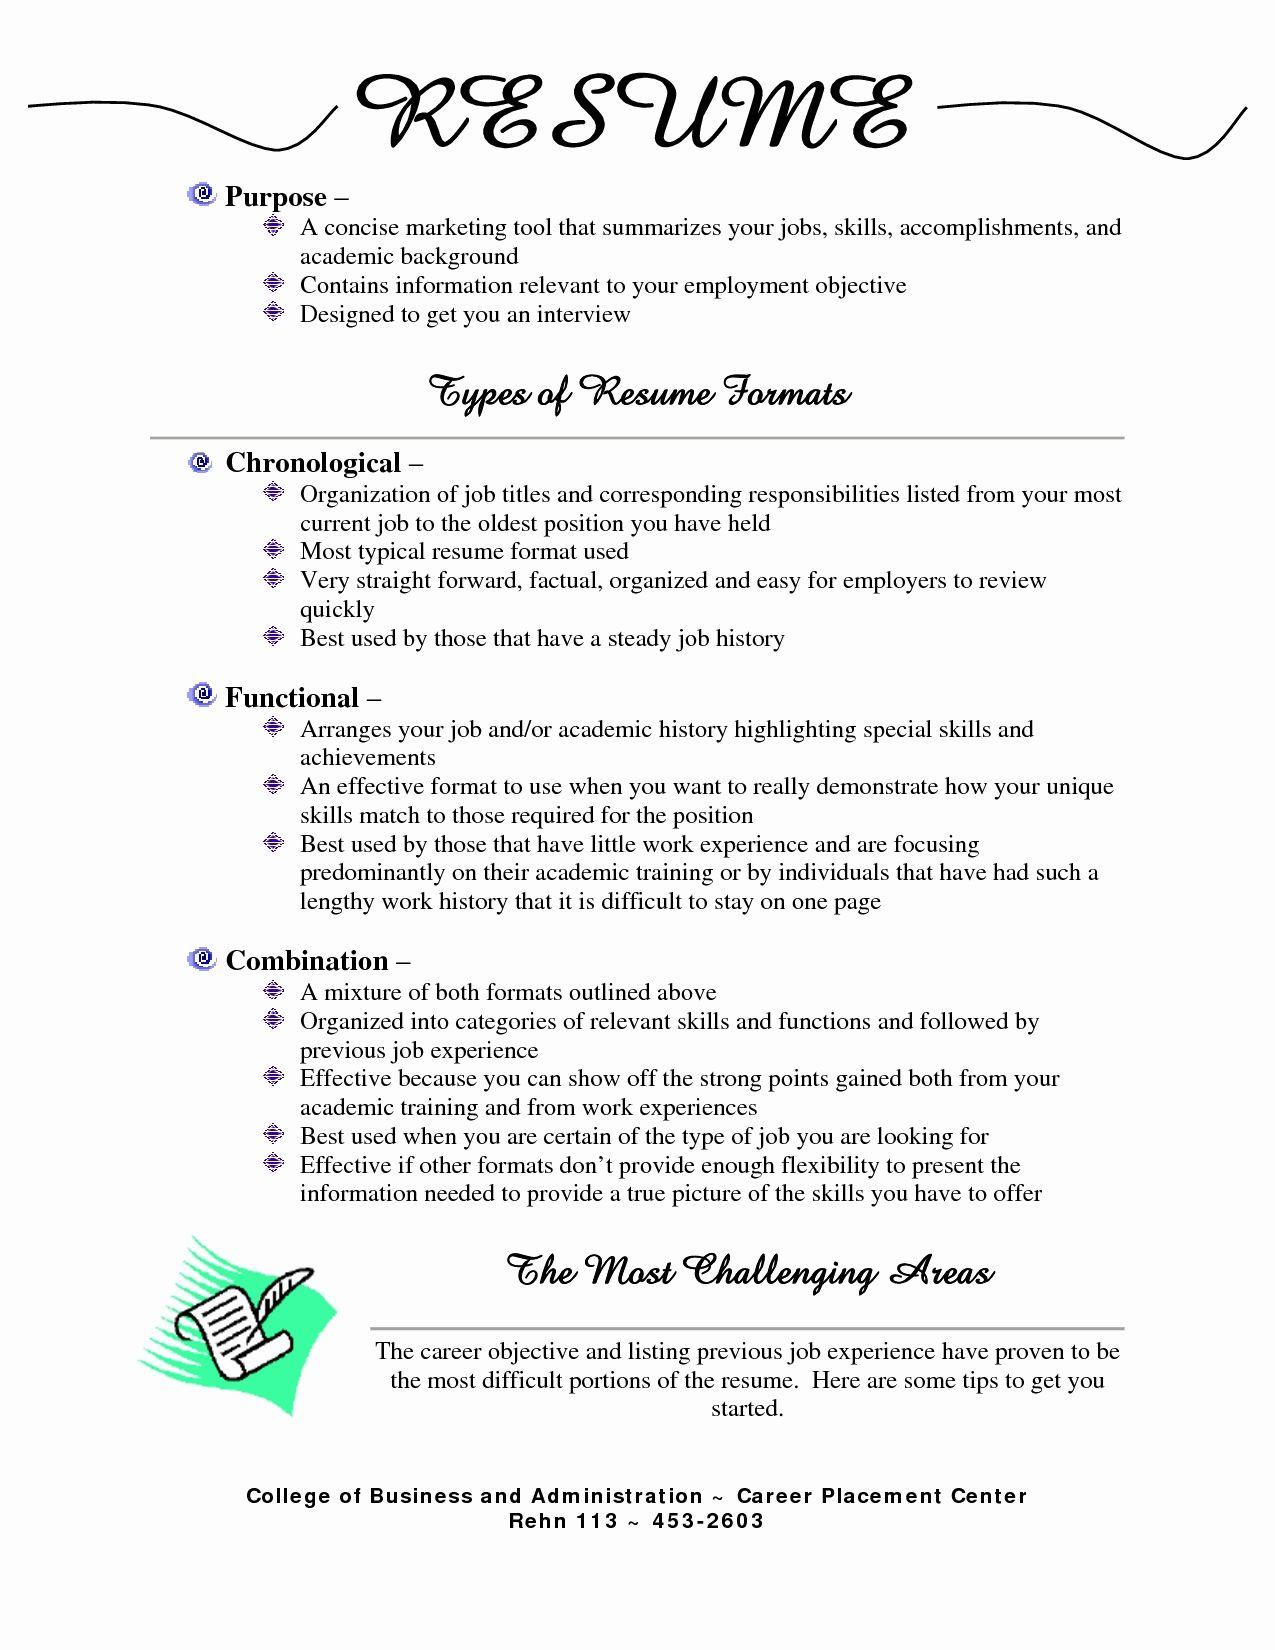 Resume Format Types Resume Templates Job Resume Examples Resume Format Resume Examples